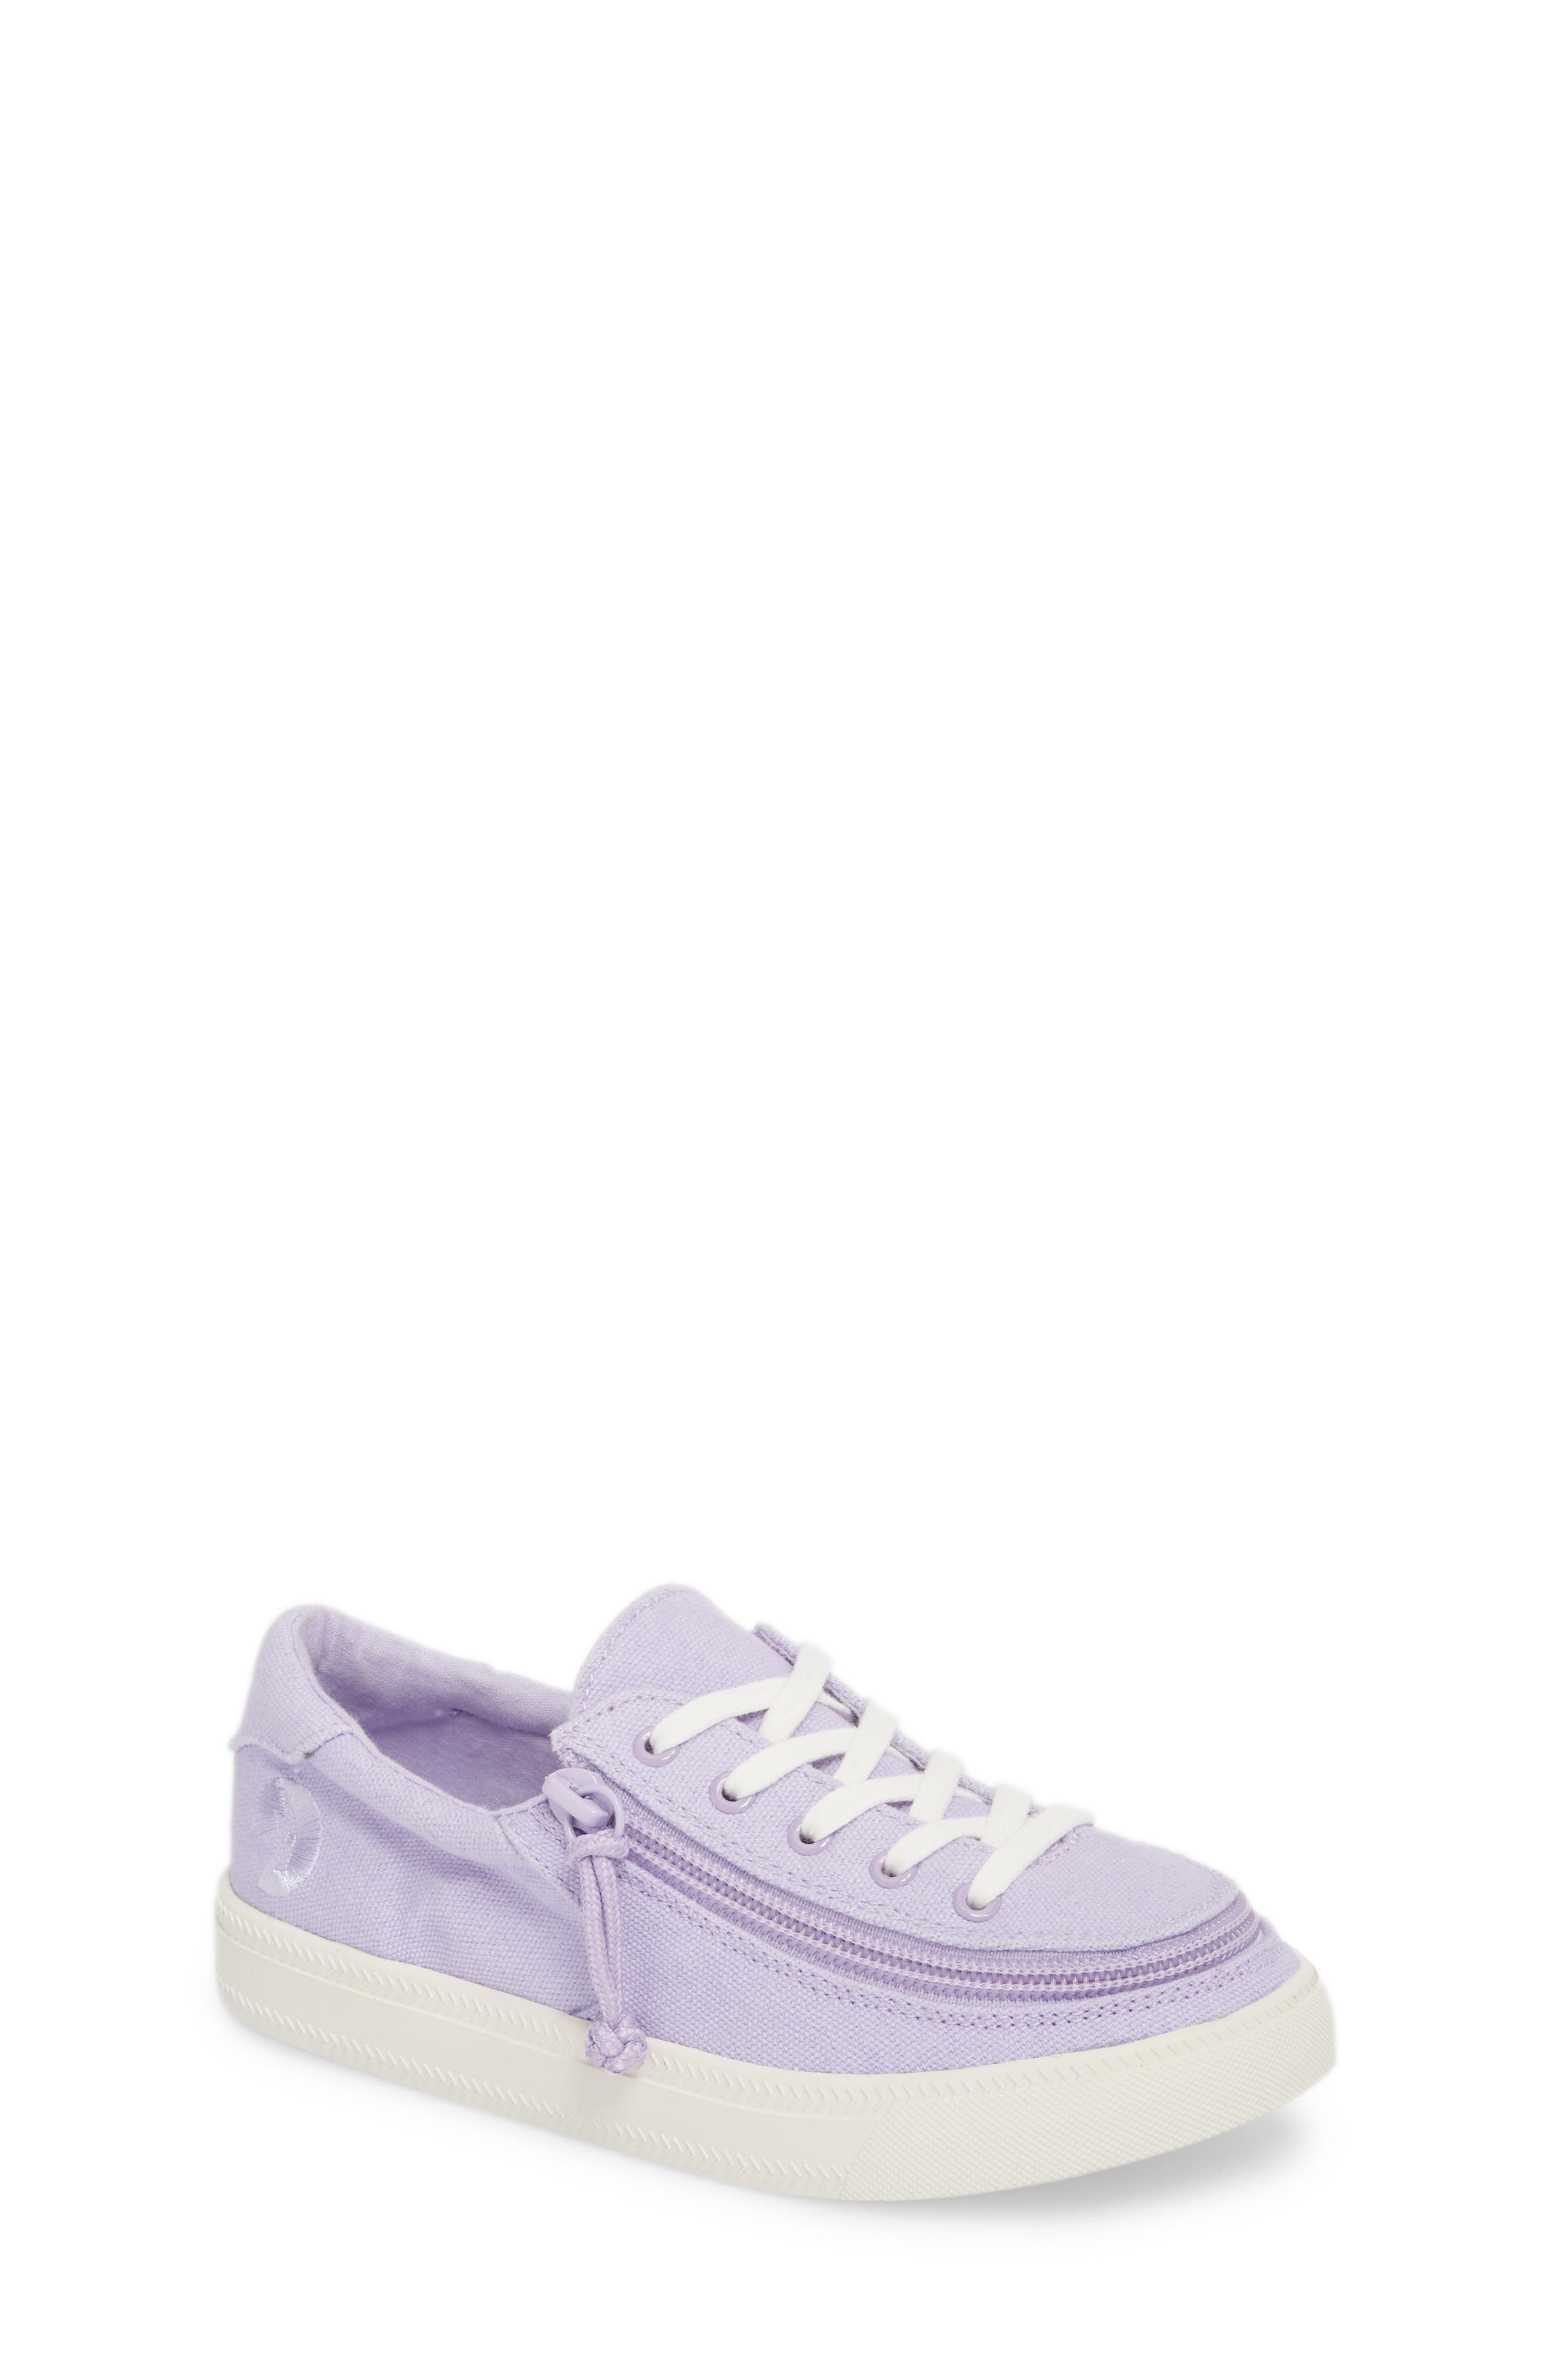 BILLY Footwear Classic Zip Around Low Top Sneaker (Toddler, Little Kid & Big Kid)